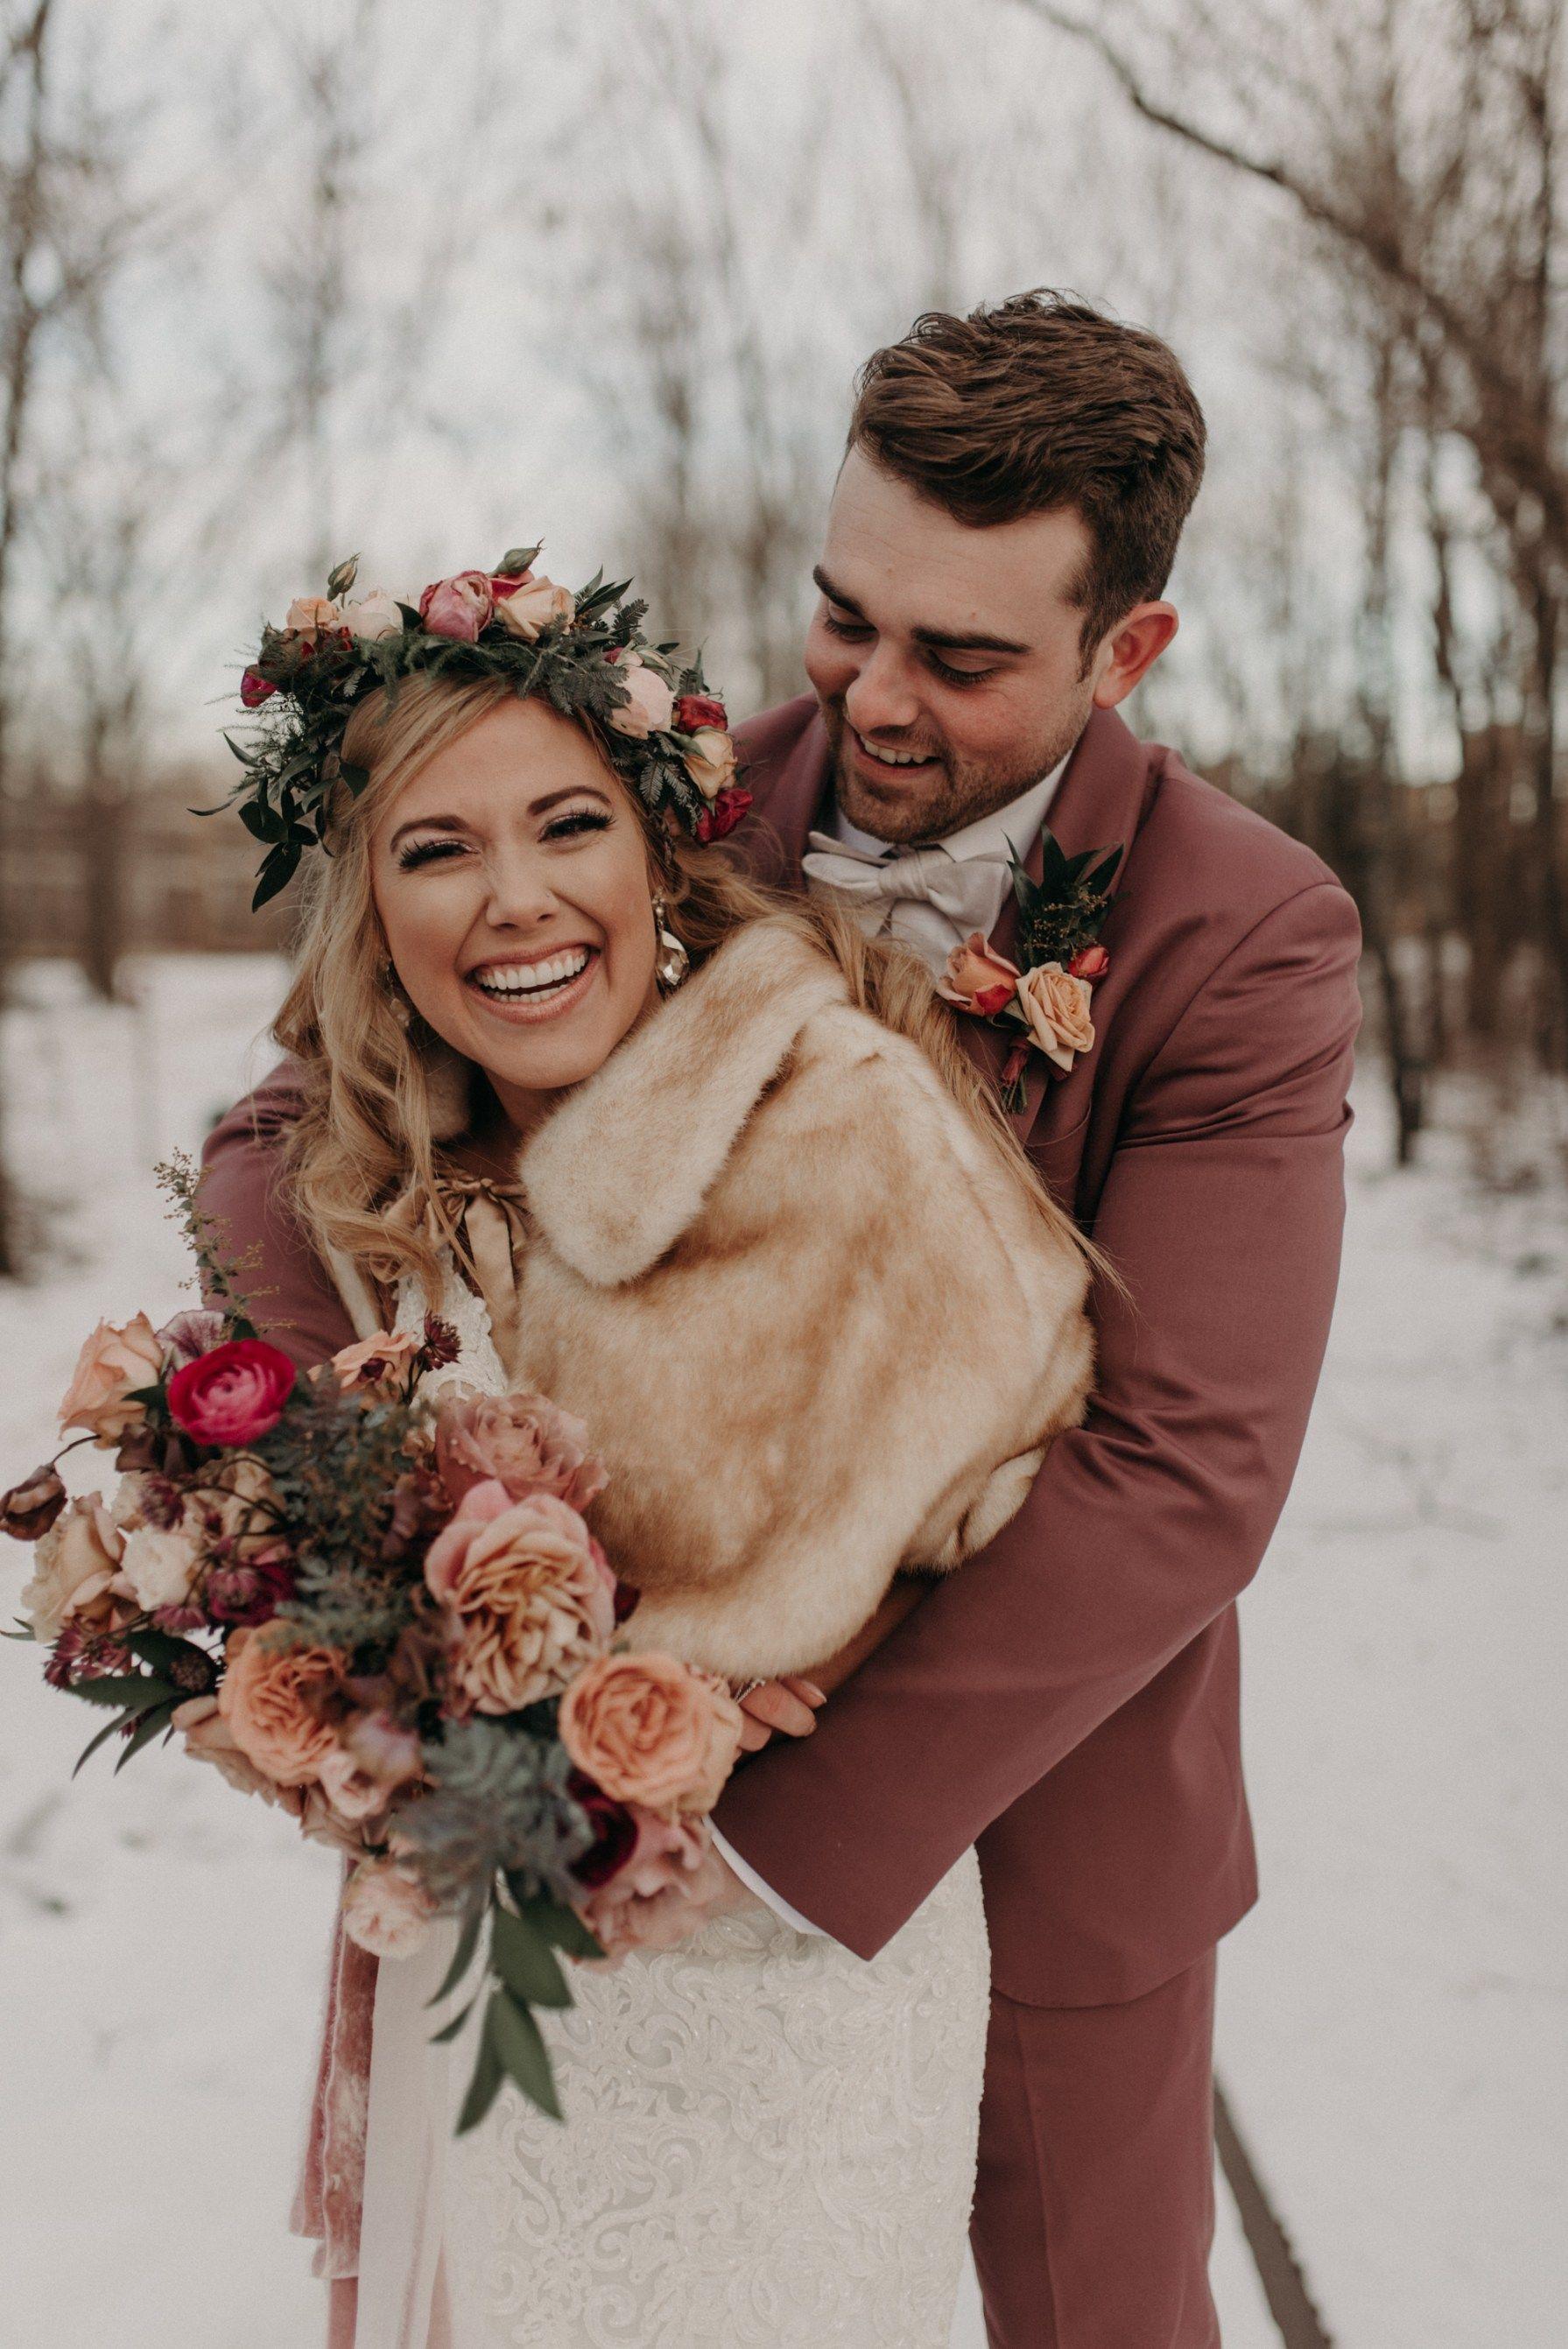 Southwind Hills Wedding » New Years Eve Wedding in